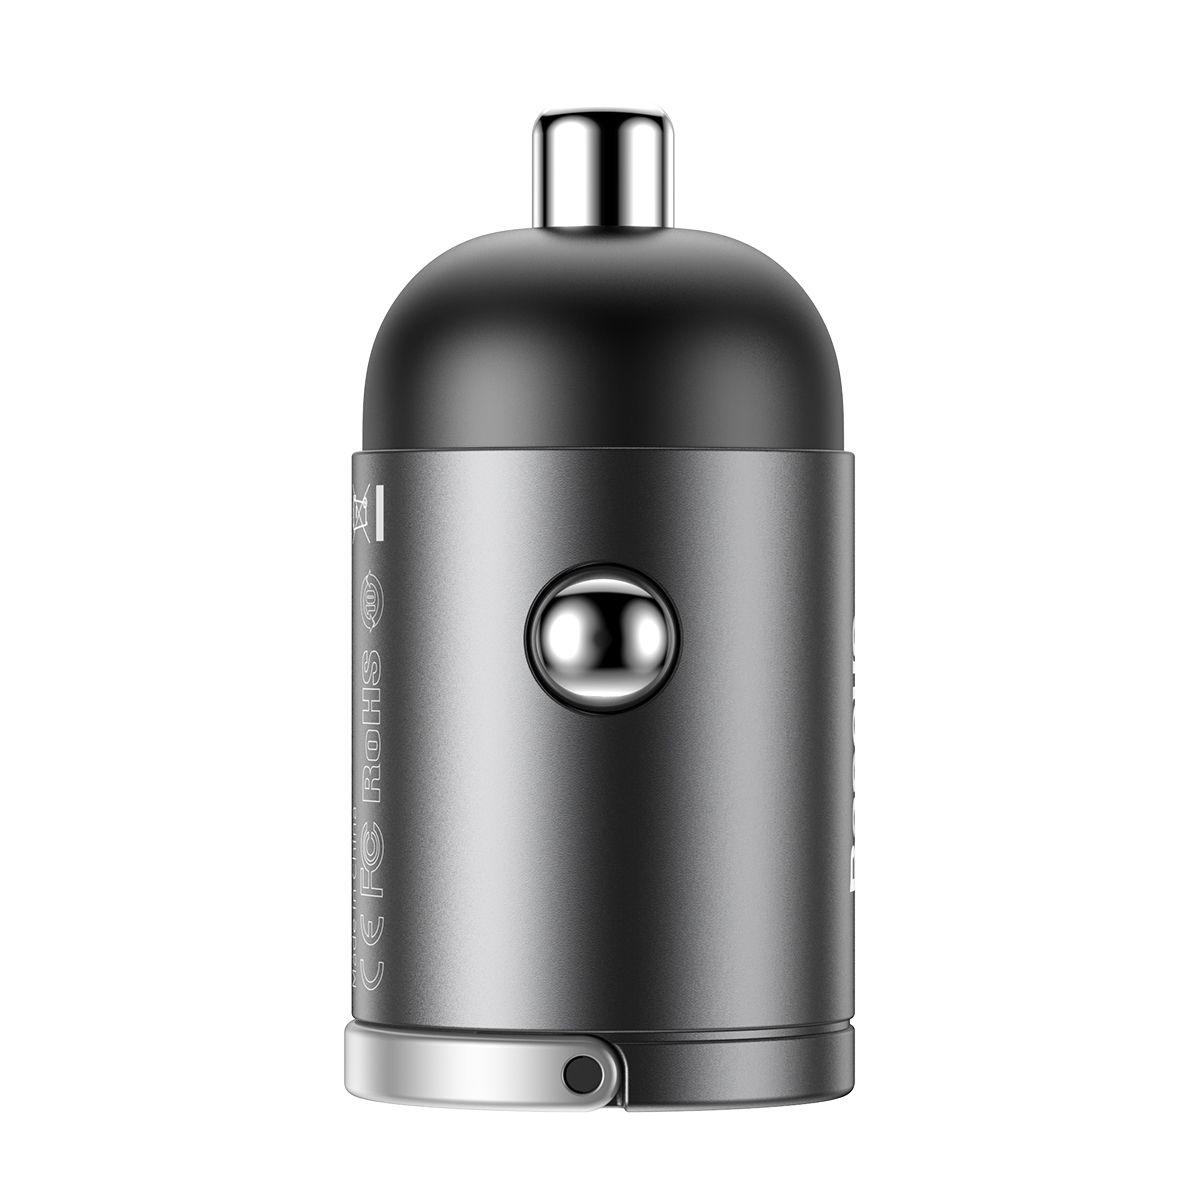 Kit Carregador Veicular Rápido Baseus Tiny Star com cabo Type-C para Lightning 18 W 1m